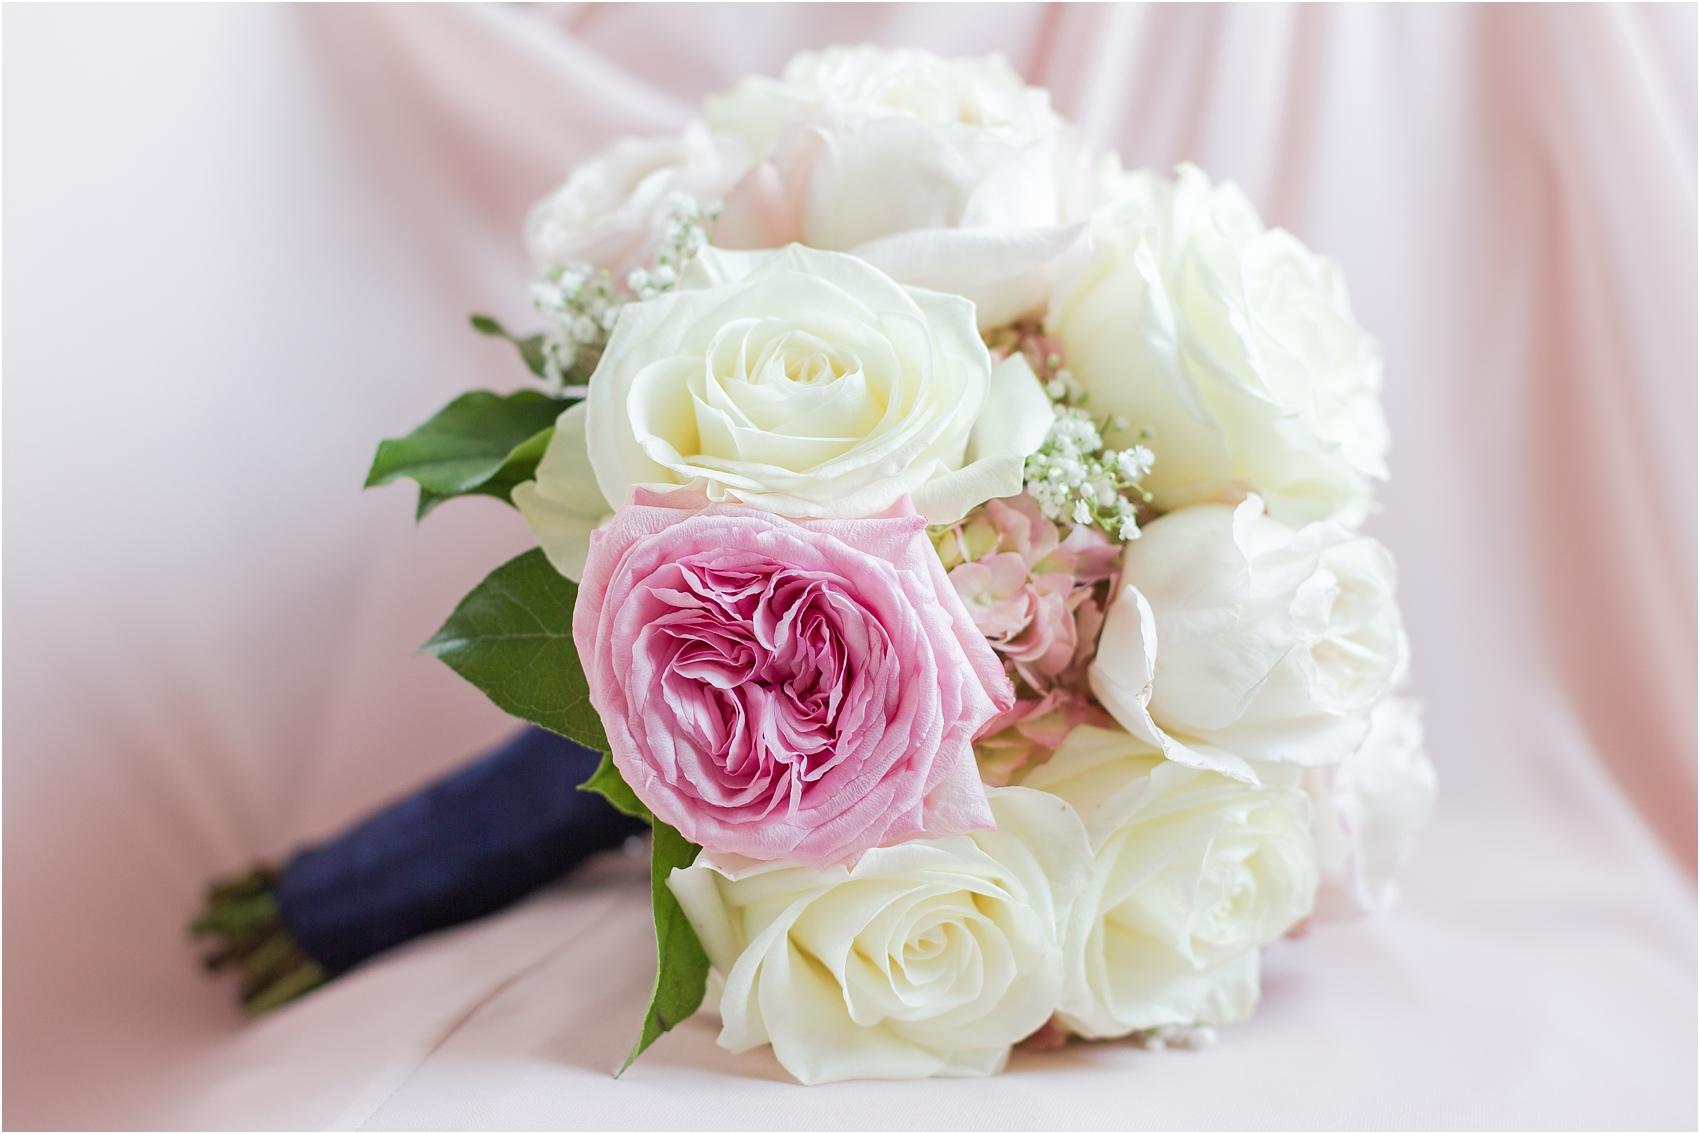 joyful-and-candid-navy-blush-wedding-photos-at-crystal-gardens-in-howell-mi-by-courtney-carolyn-photography_0005.jpg